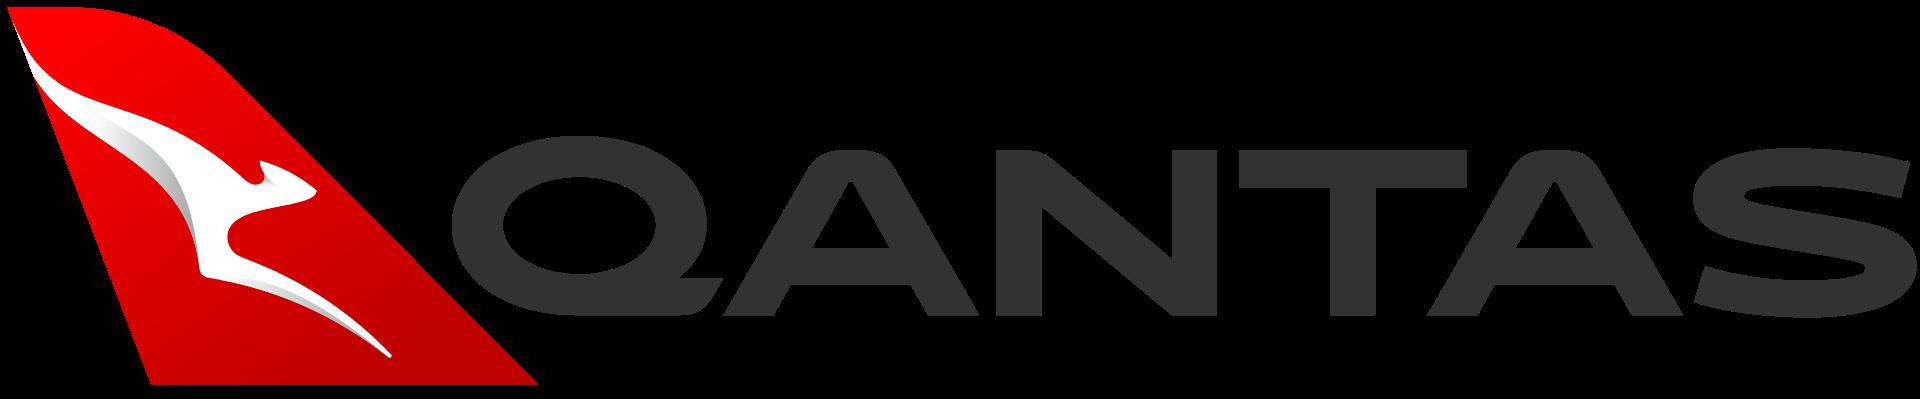 File:Qantas logo.png -...